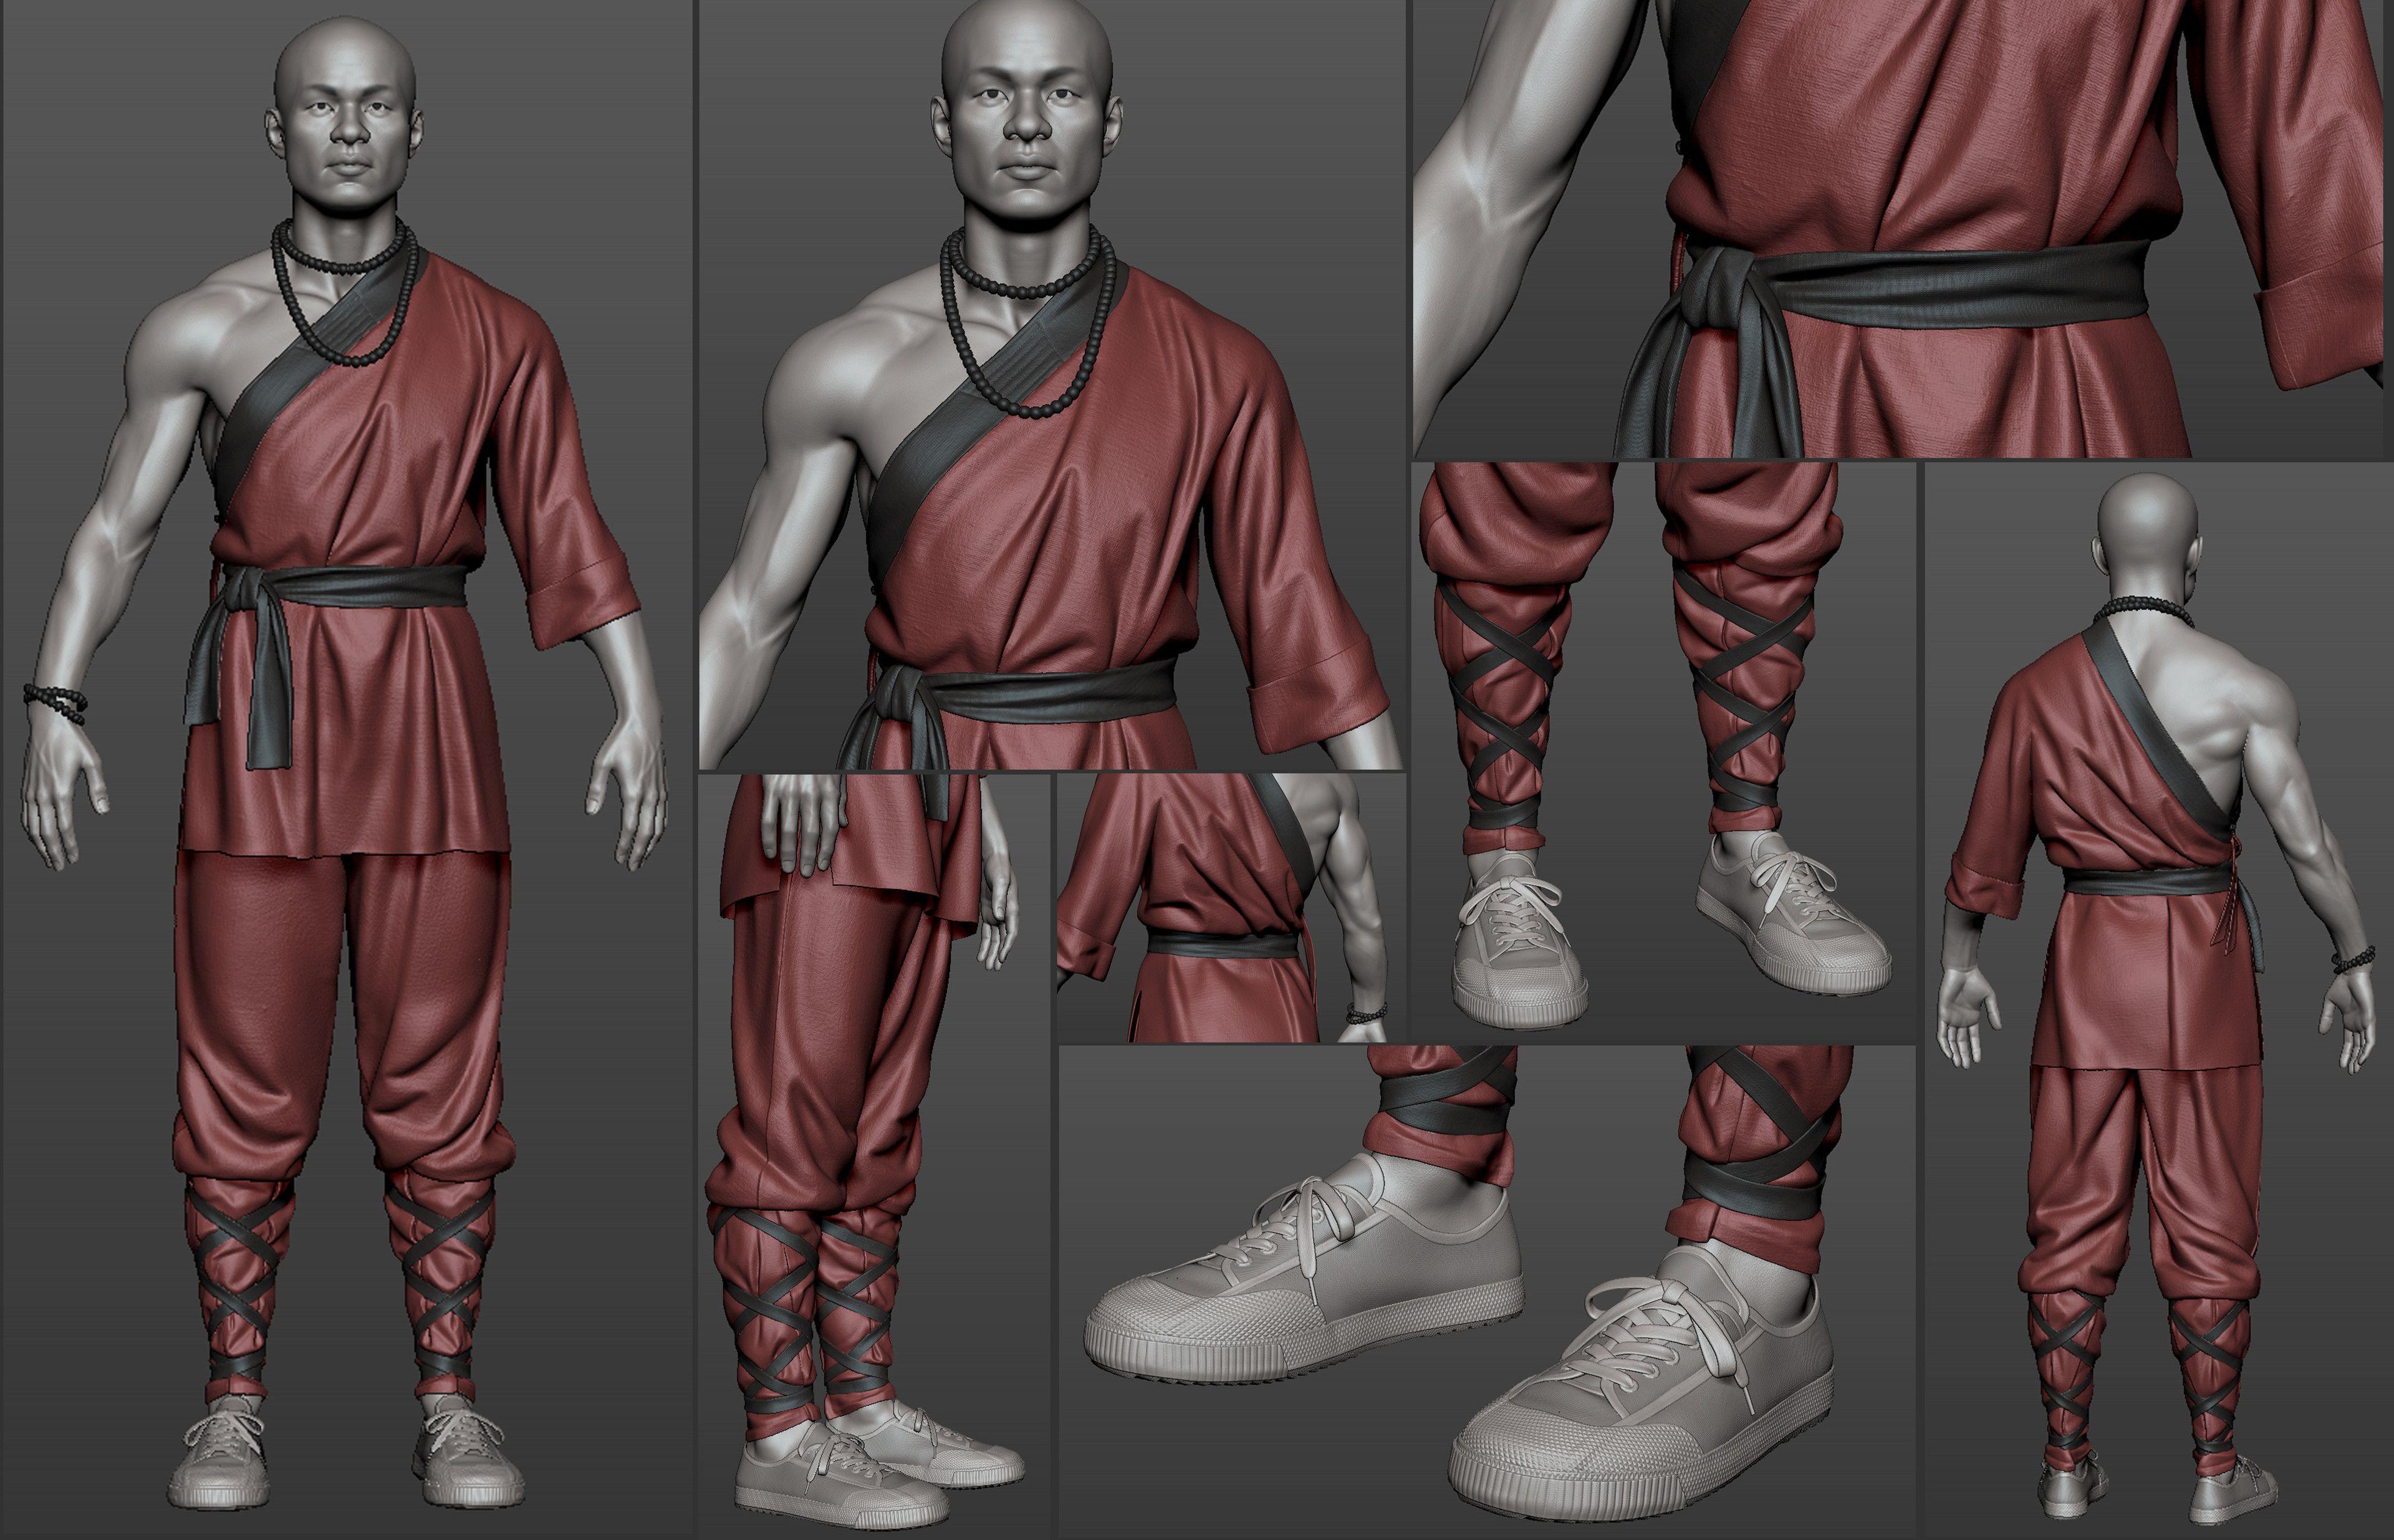 Artstation Monk Yuriy Porubov Cool Outfits Model Marvelous Designer